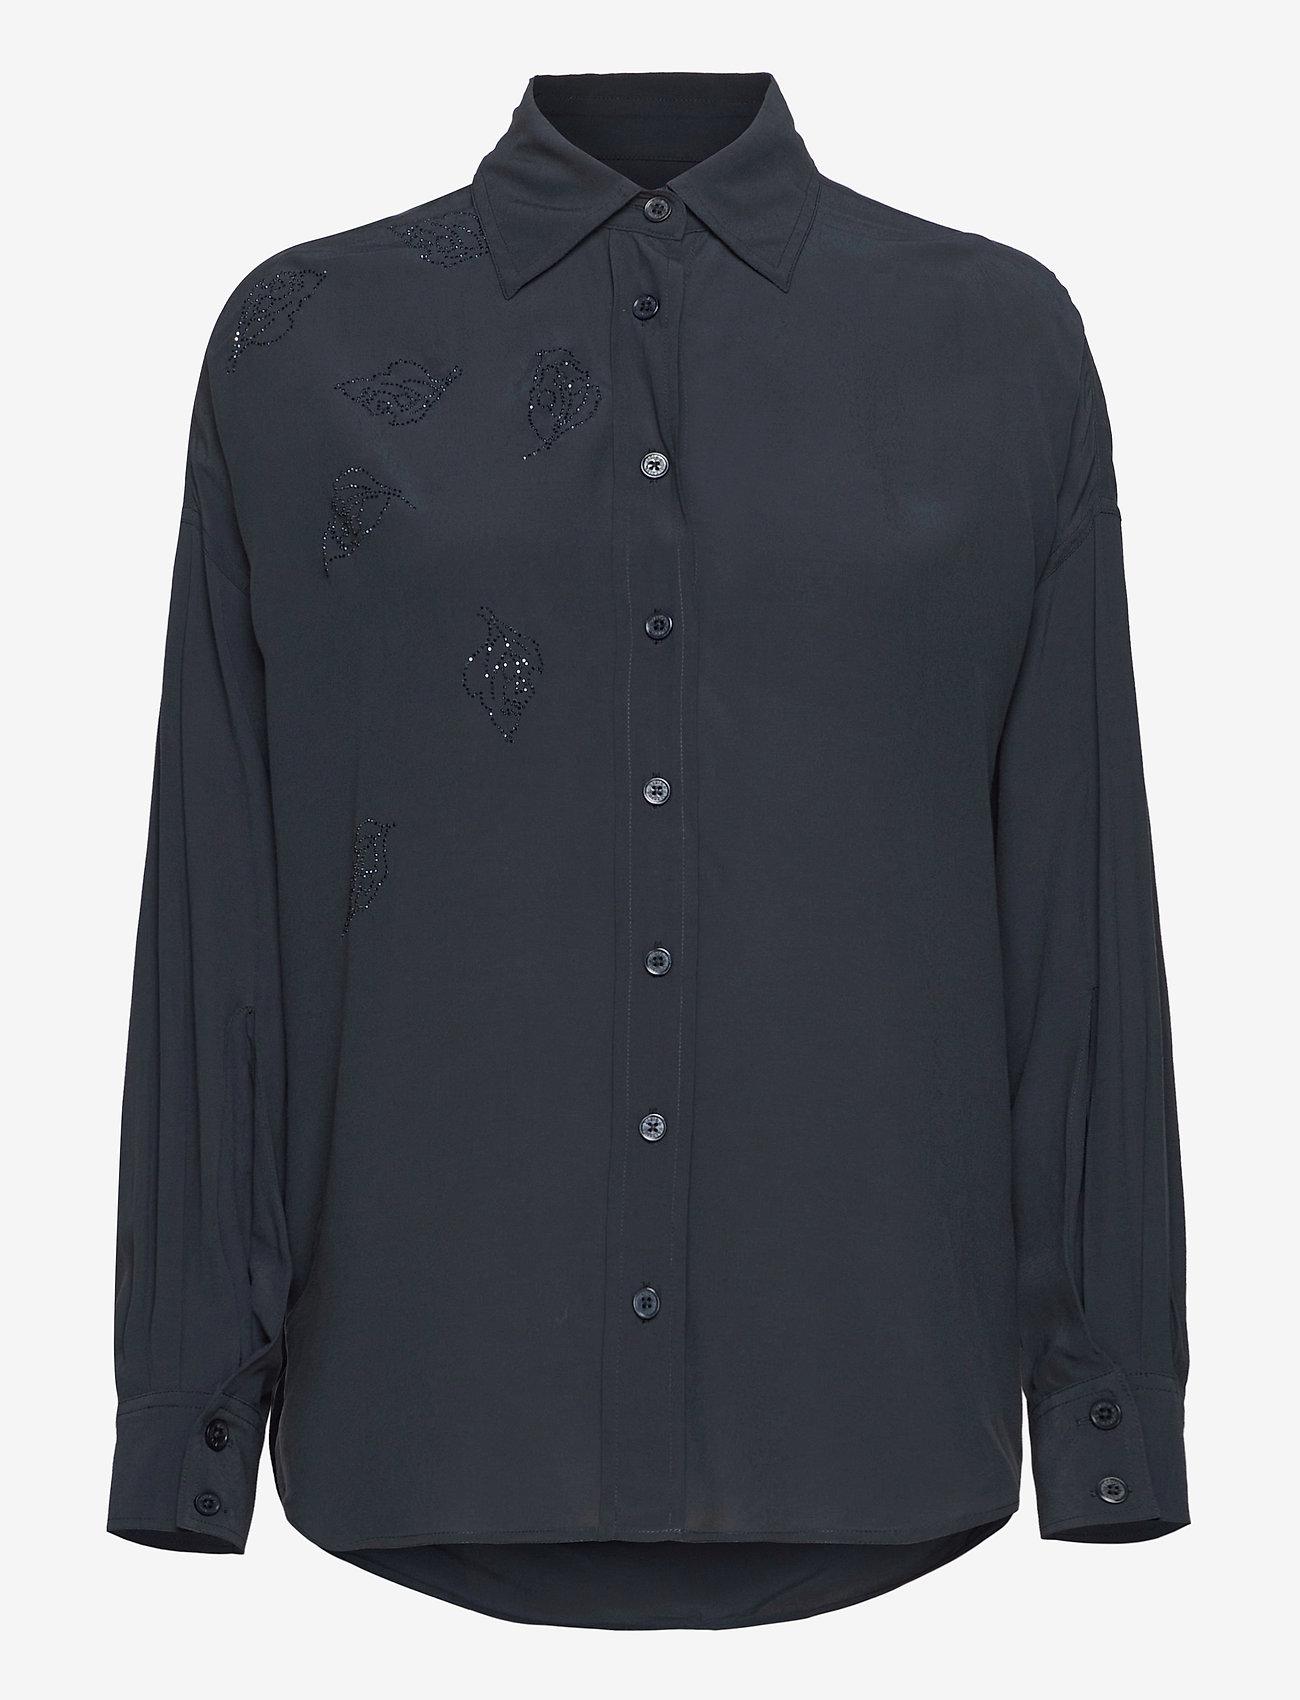 Zadig & Voltaire - TAMARA STRASS SHIRT - langærmede skjorter - navy blue - 0